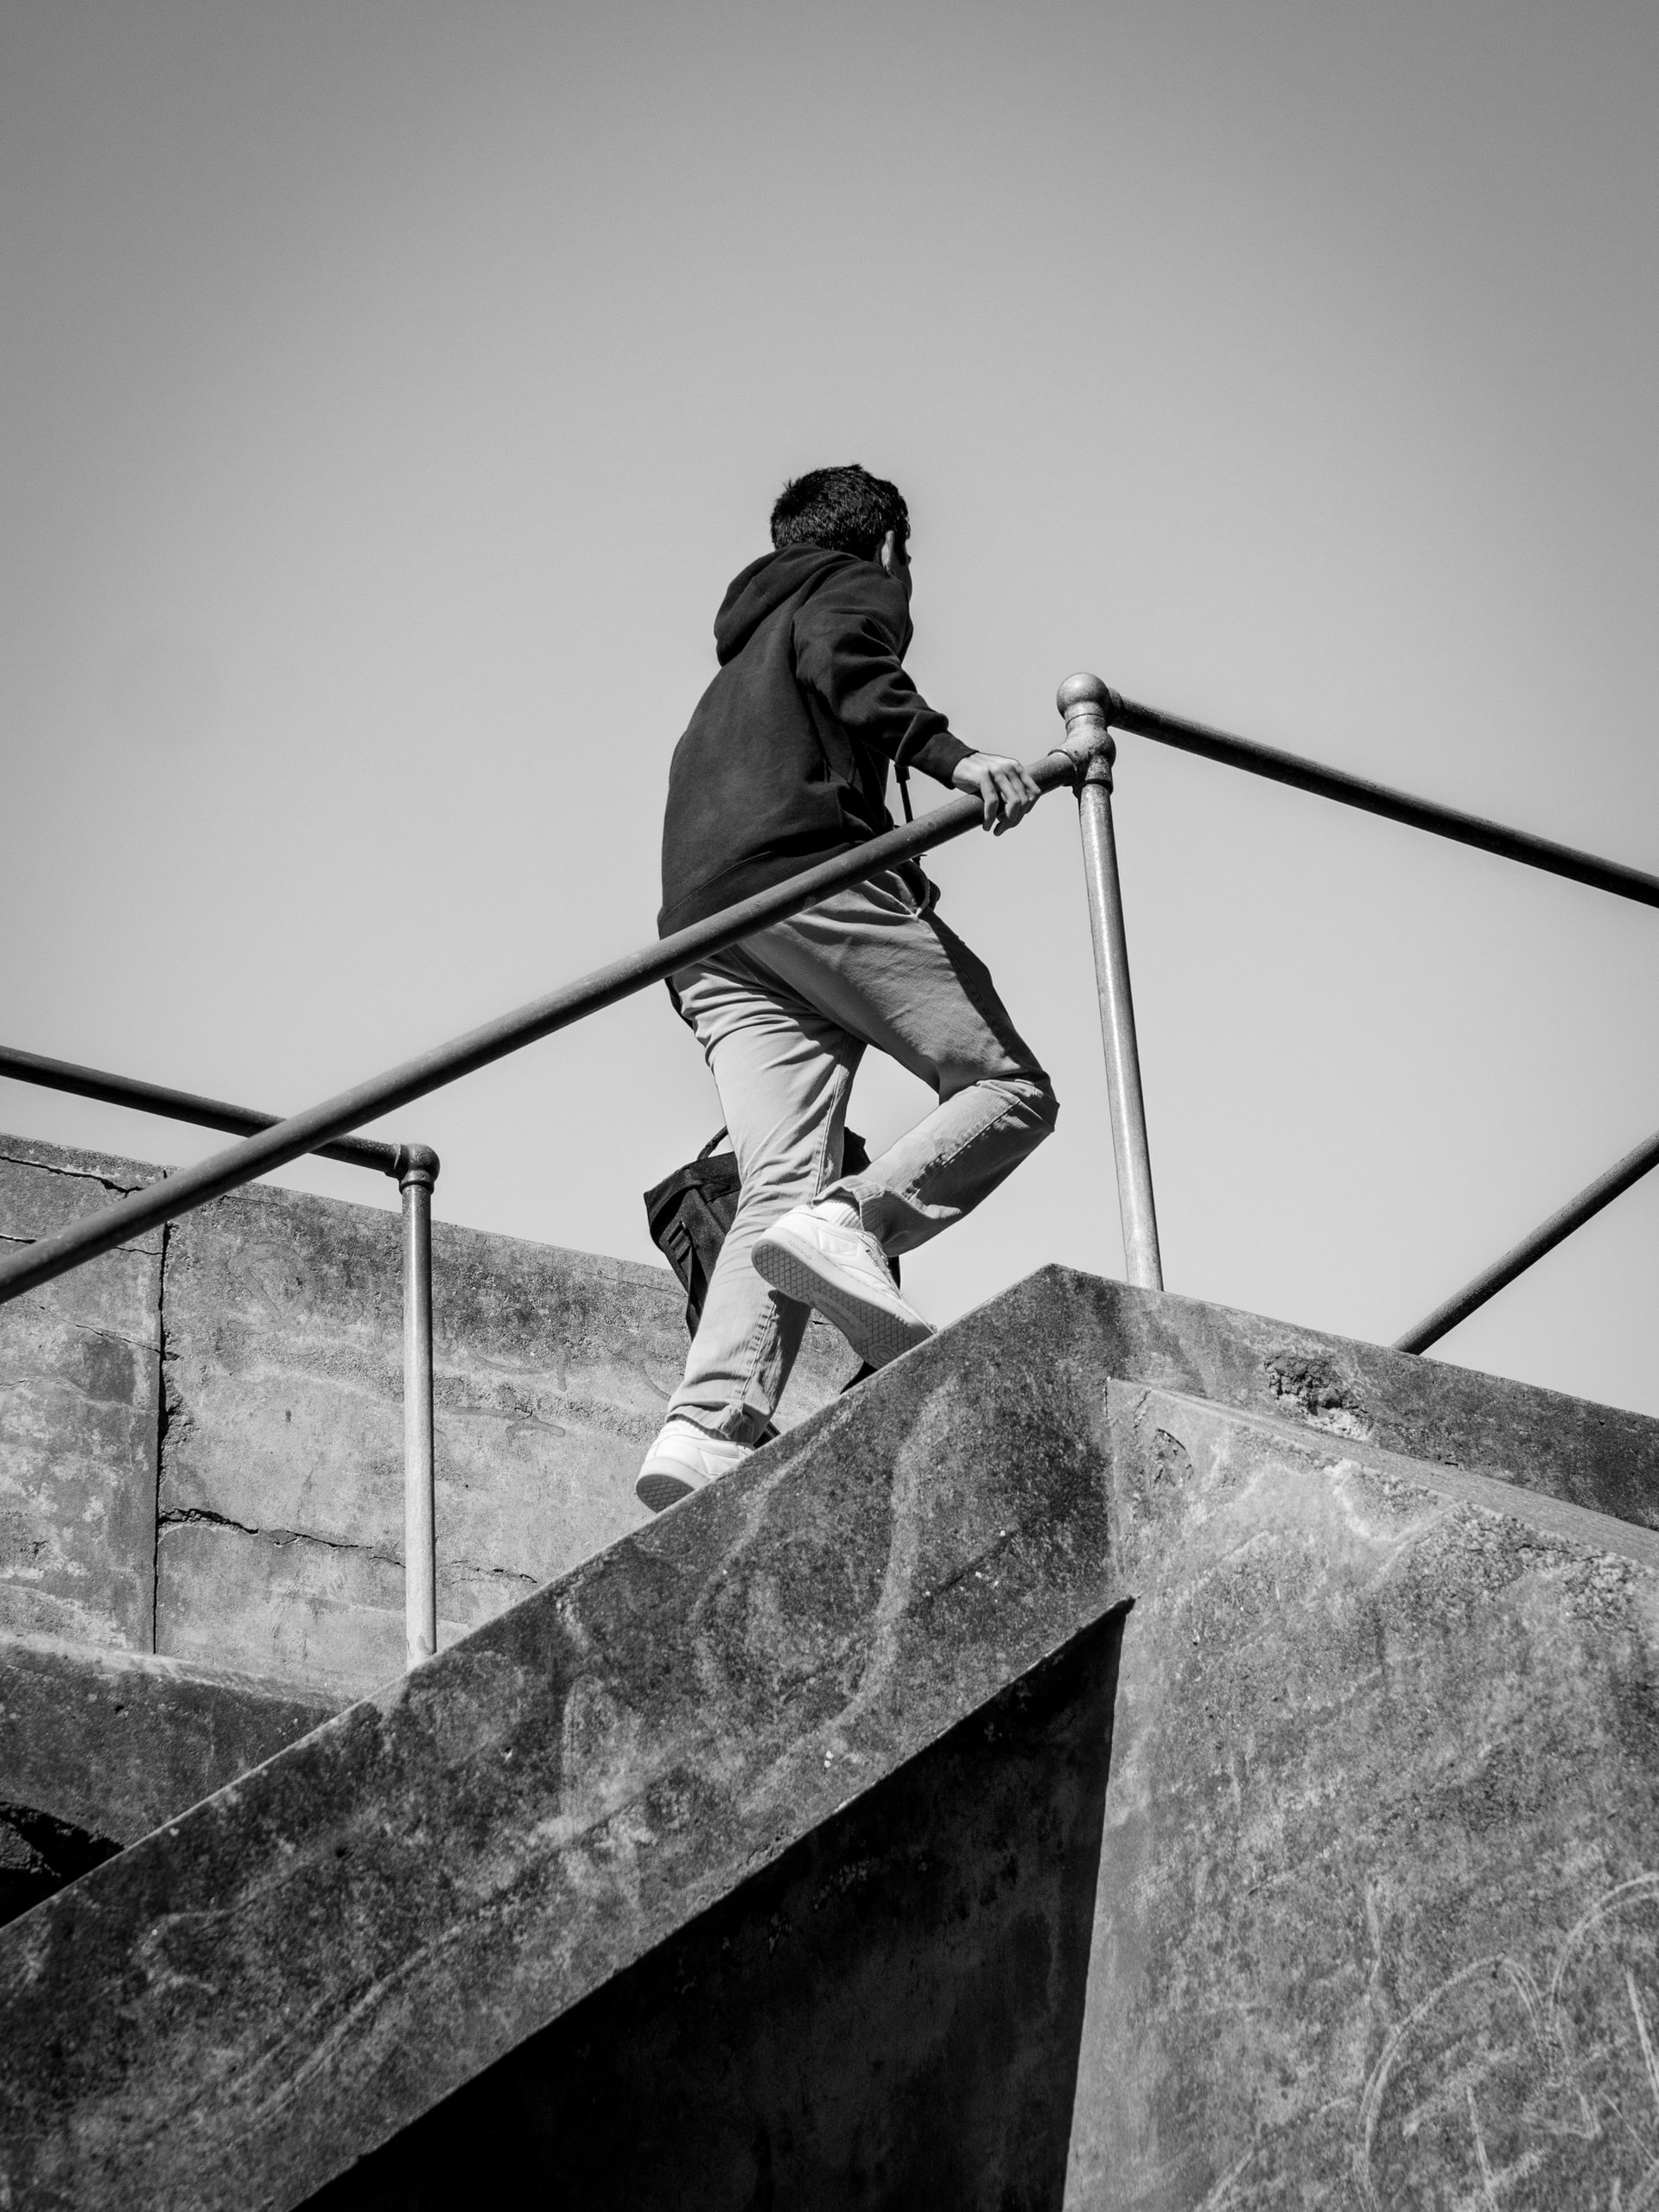 Man climbing concrete stairs